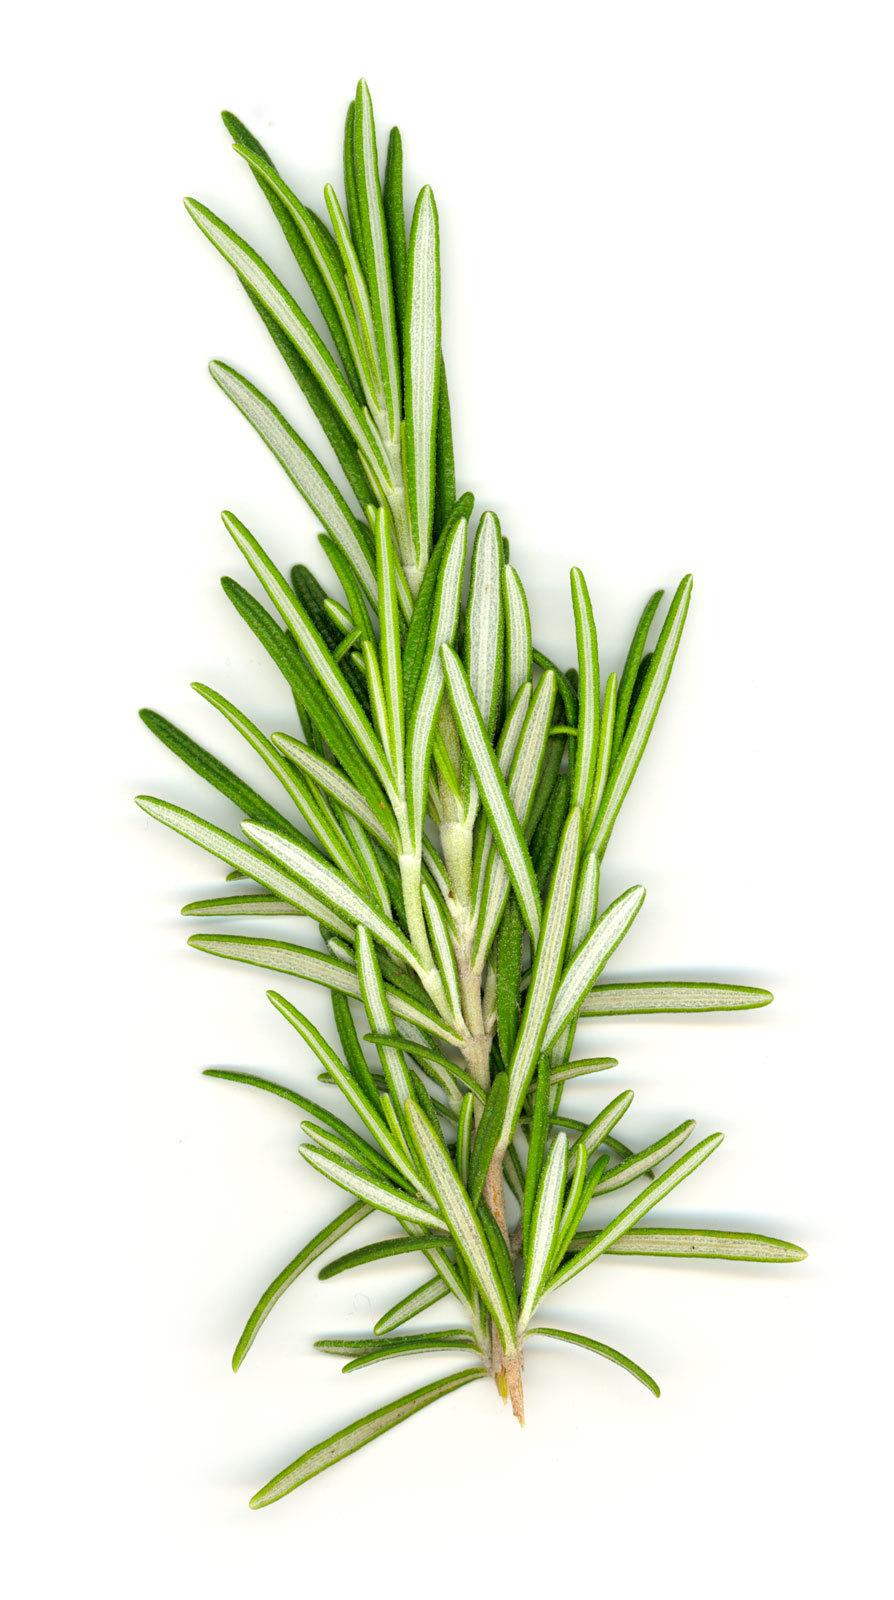 D'Olivo Wild Rosemary Olive Oil 126